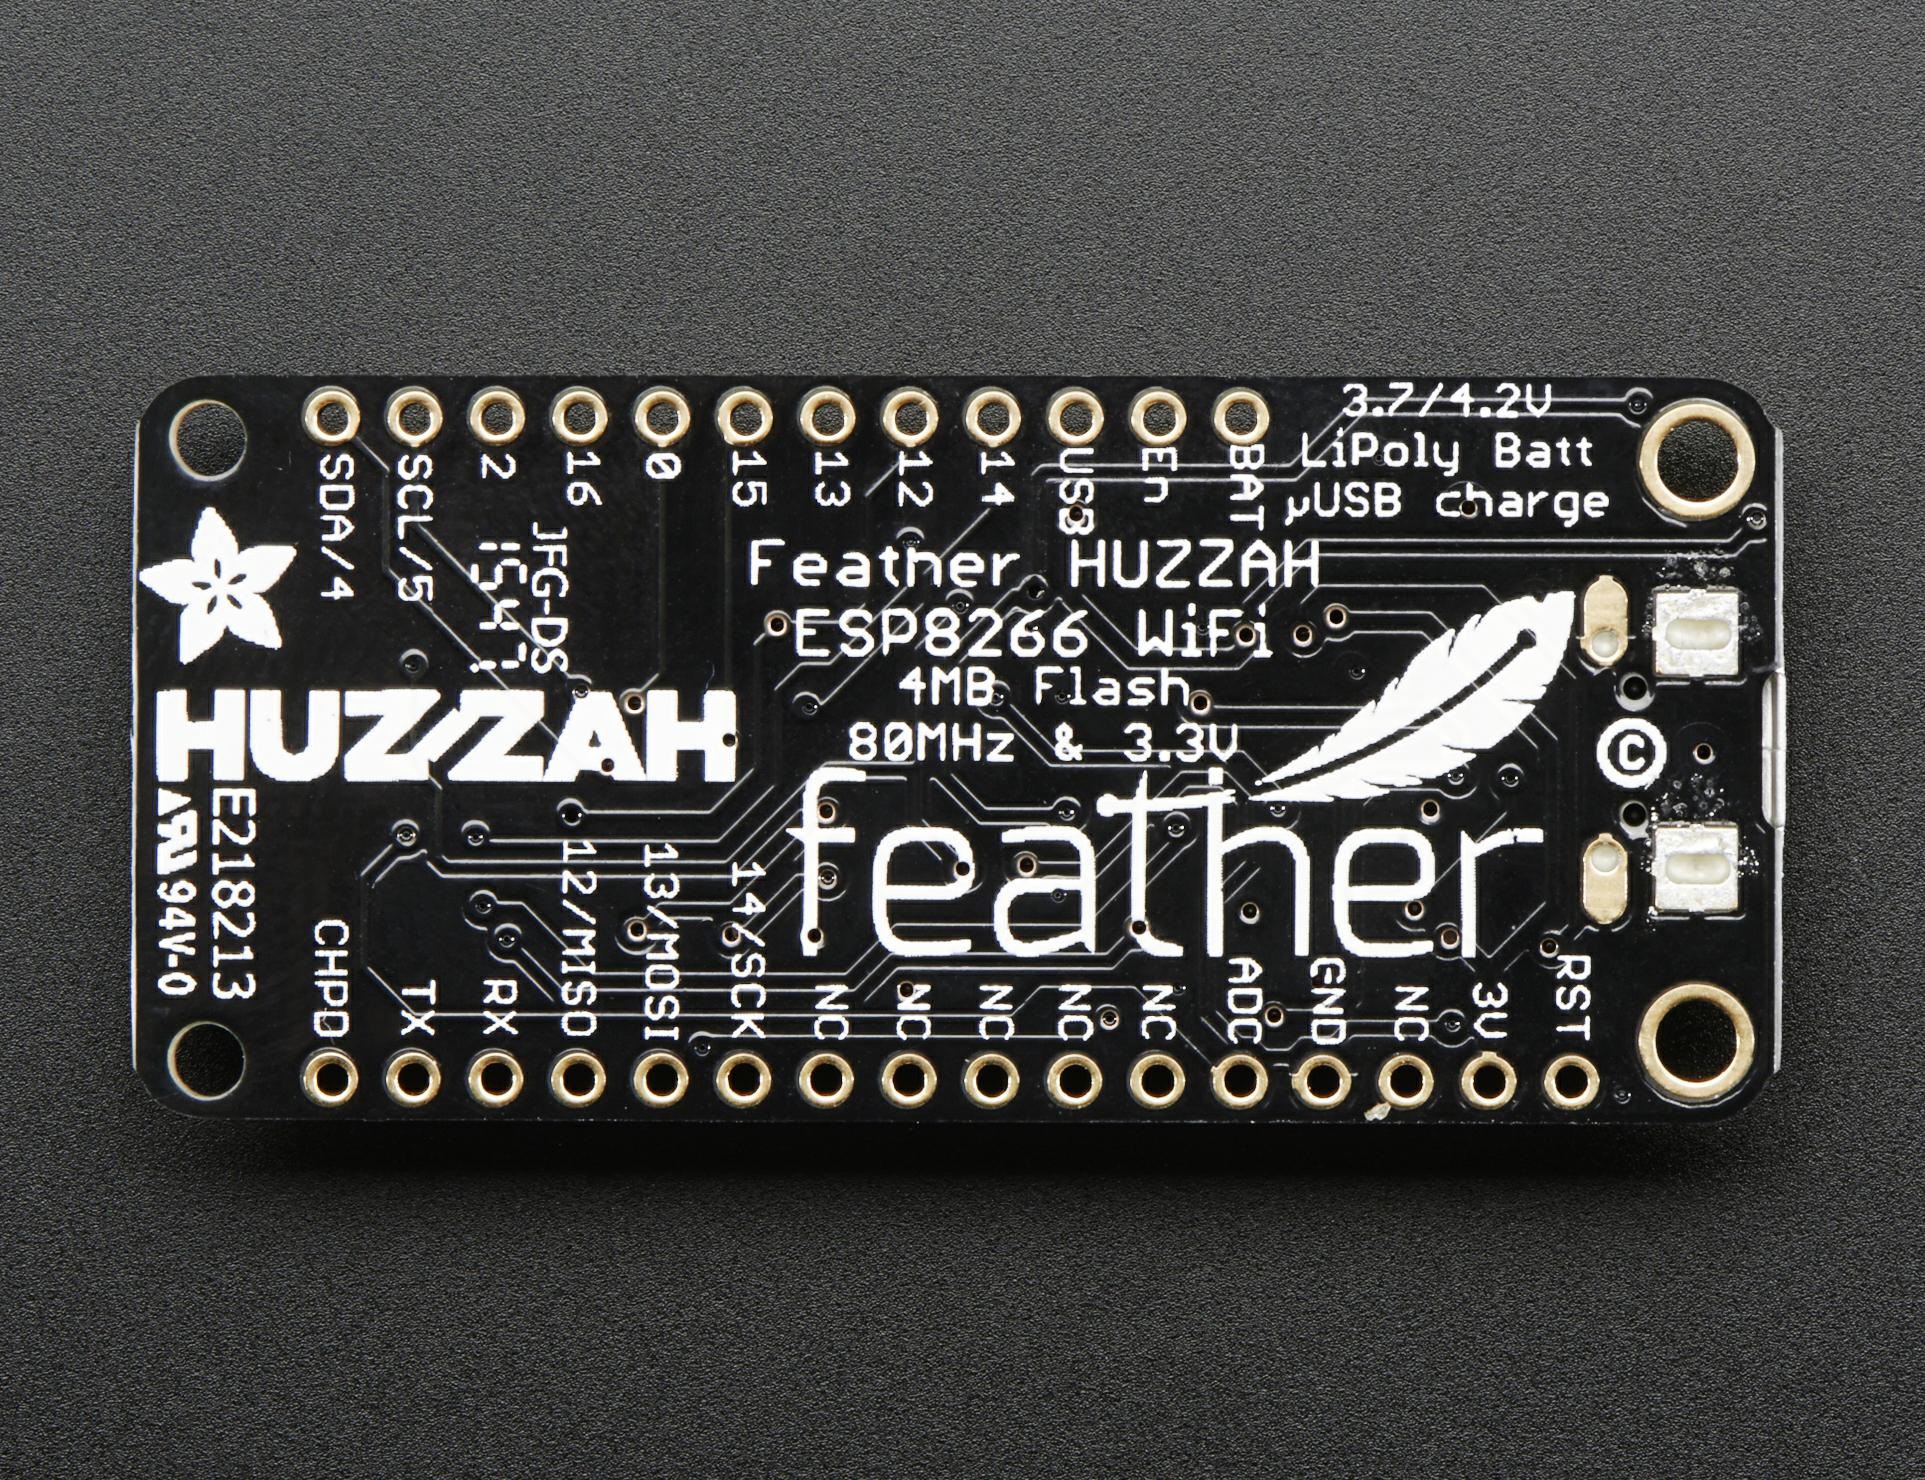 feather_adafruit_products_2821_back_ORIG.jpg